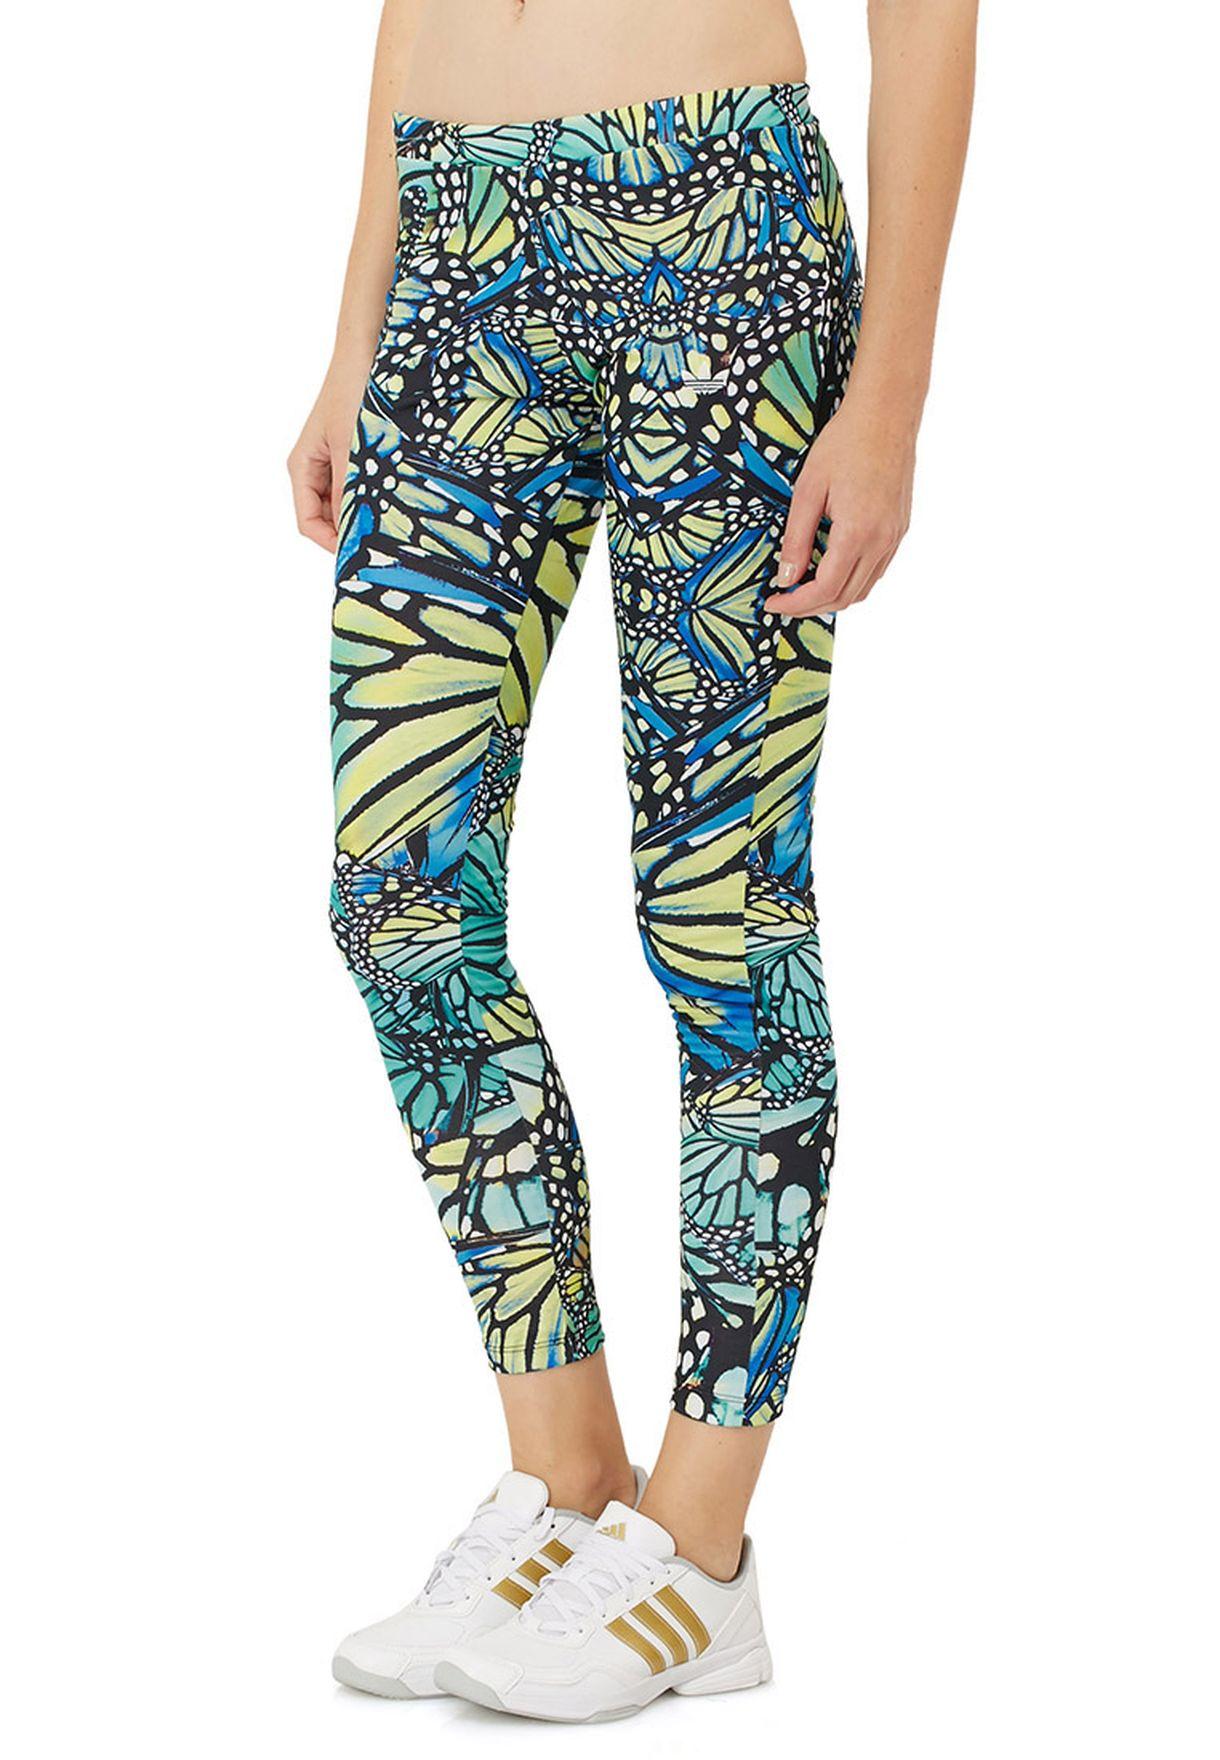 143957f91585c8 Shop adidas Originals multicolor Butterfly Print Leggings M69750 for ...